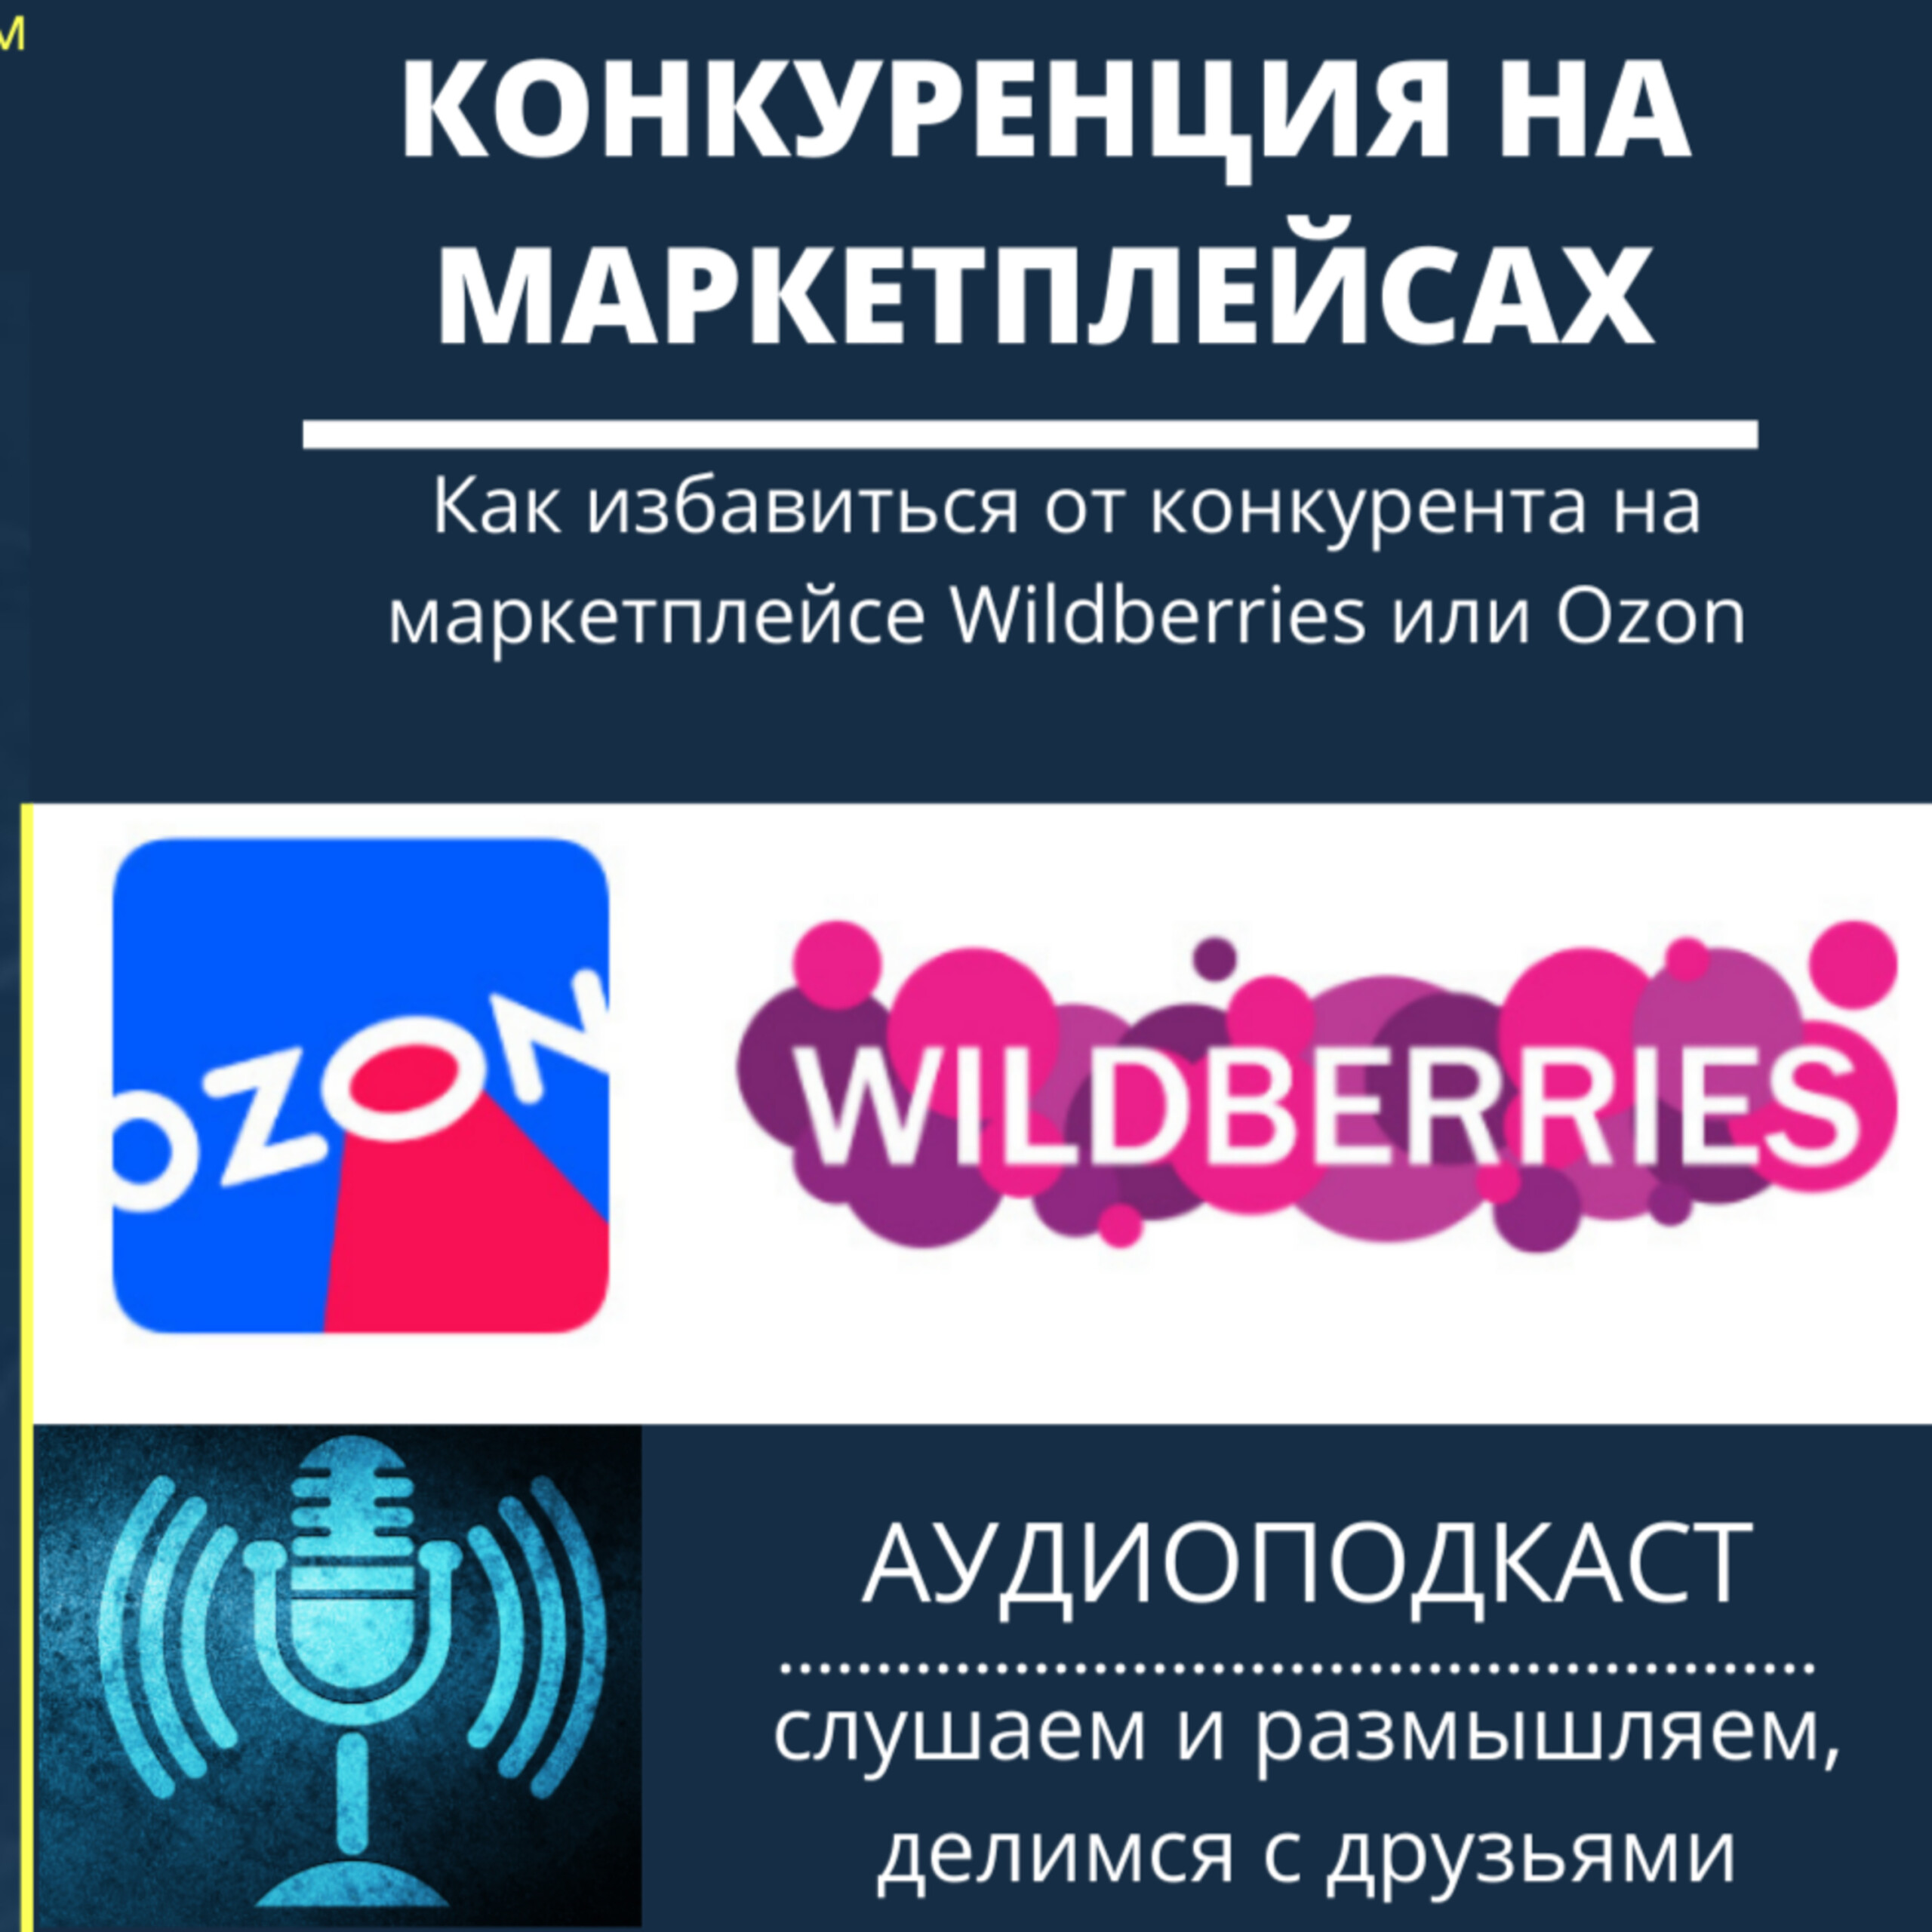 Как избавиться от конкурента на маркетплейсе Wildberries или Ozon